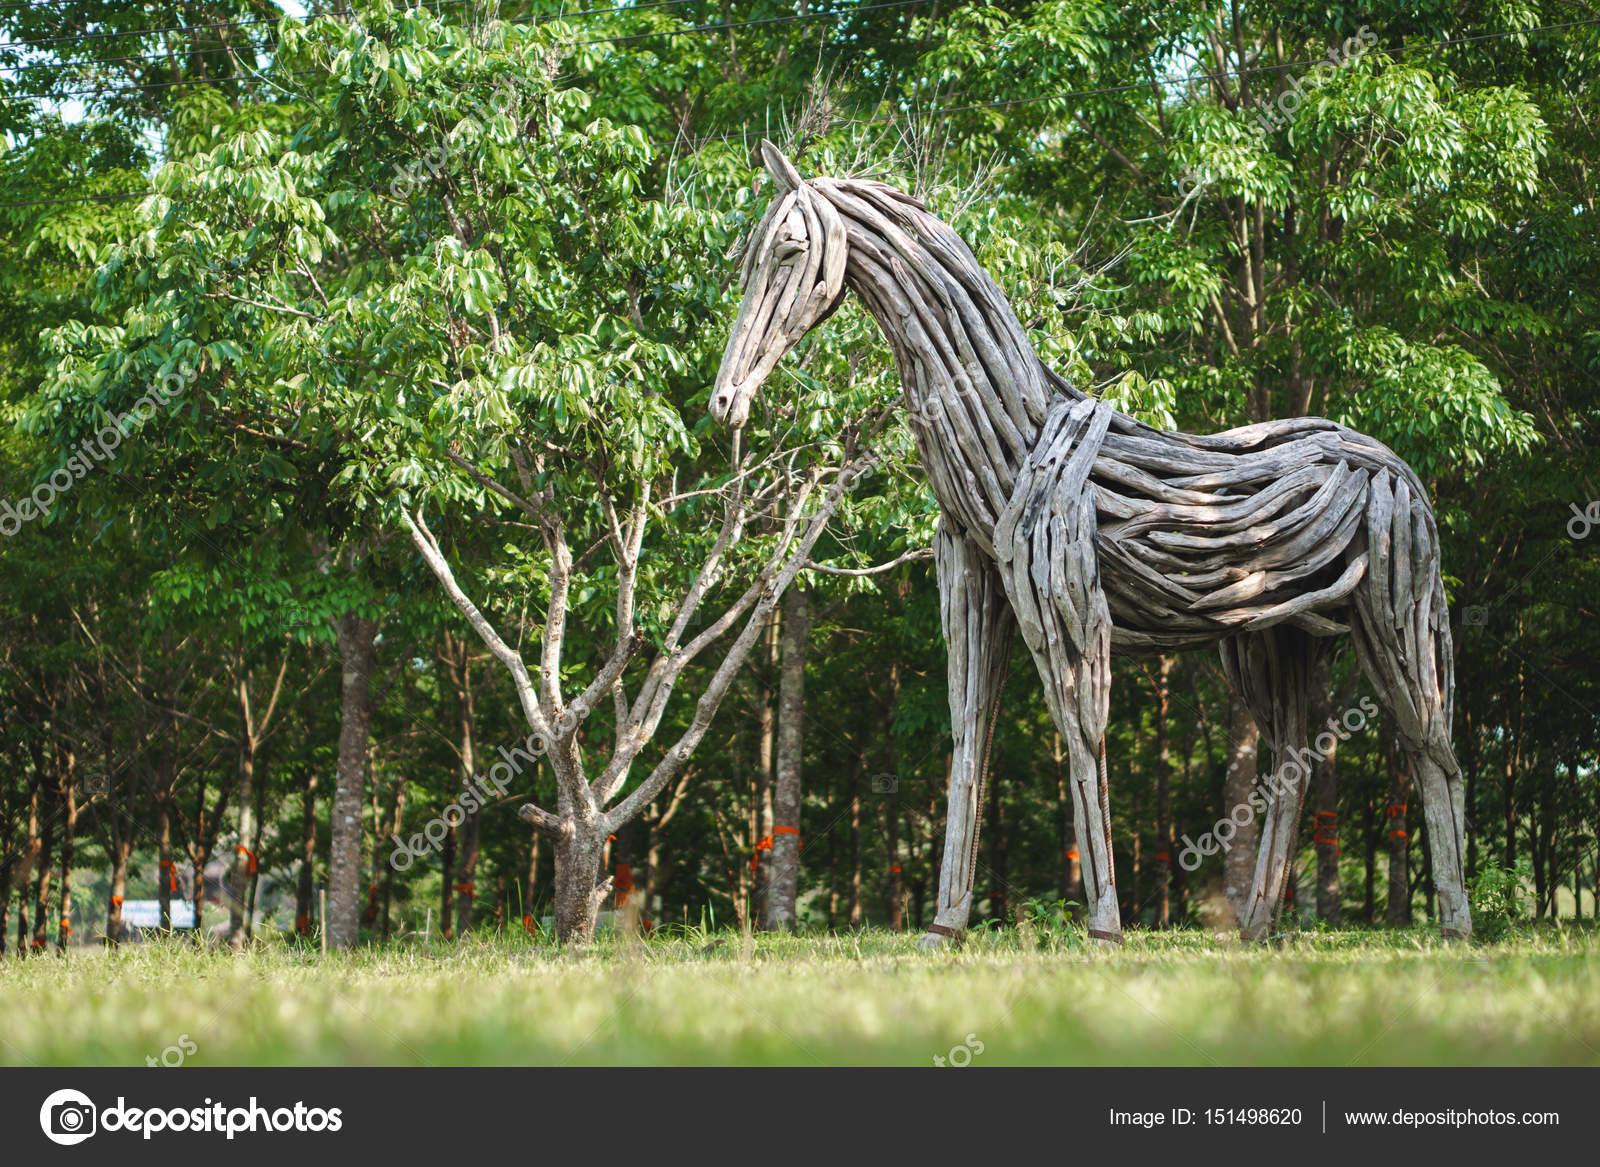 Horse Sculptures Made From Driftwood Wooden Horse Statue Made Of Driftwood Stock Photo C Bonnontawat 151498620